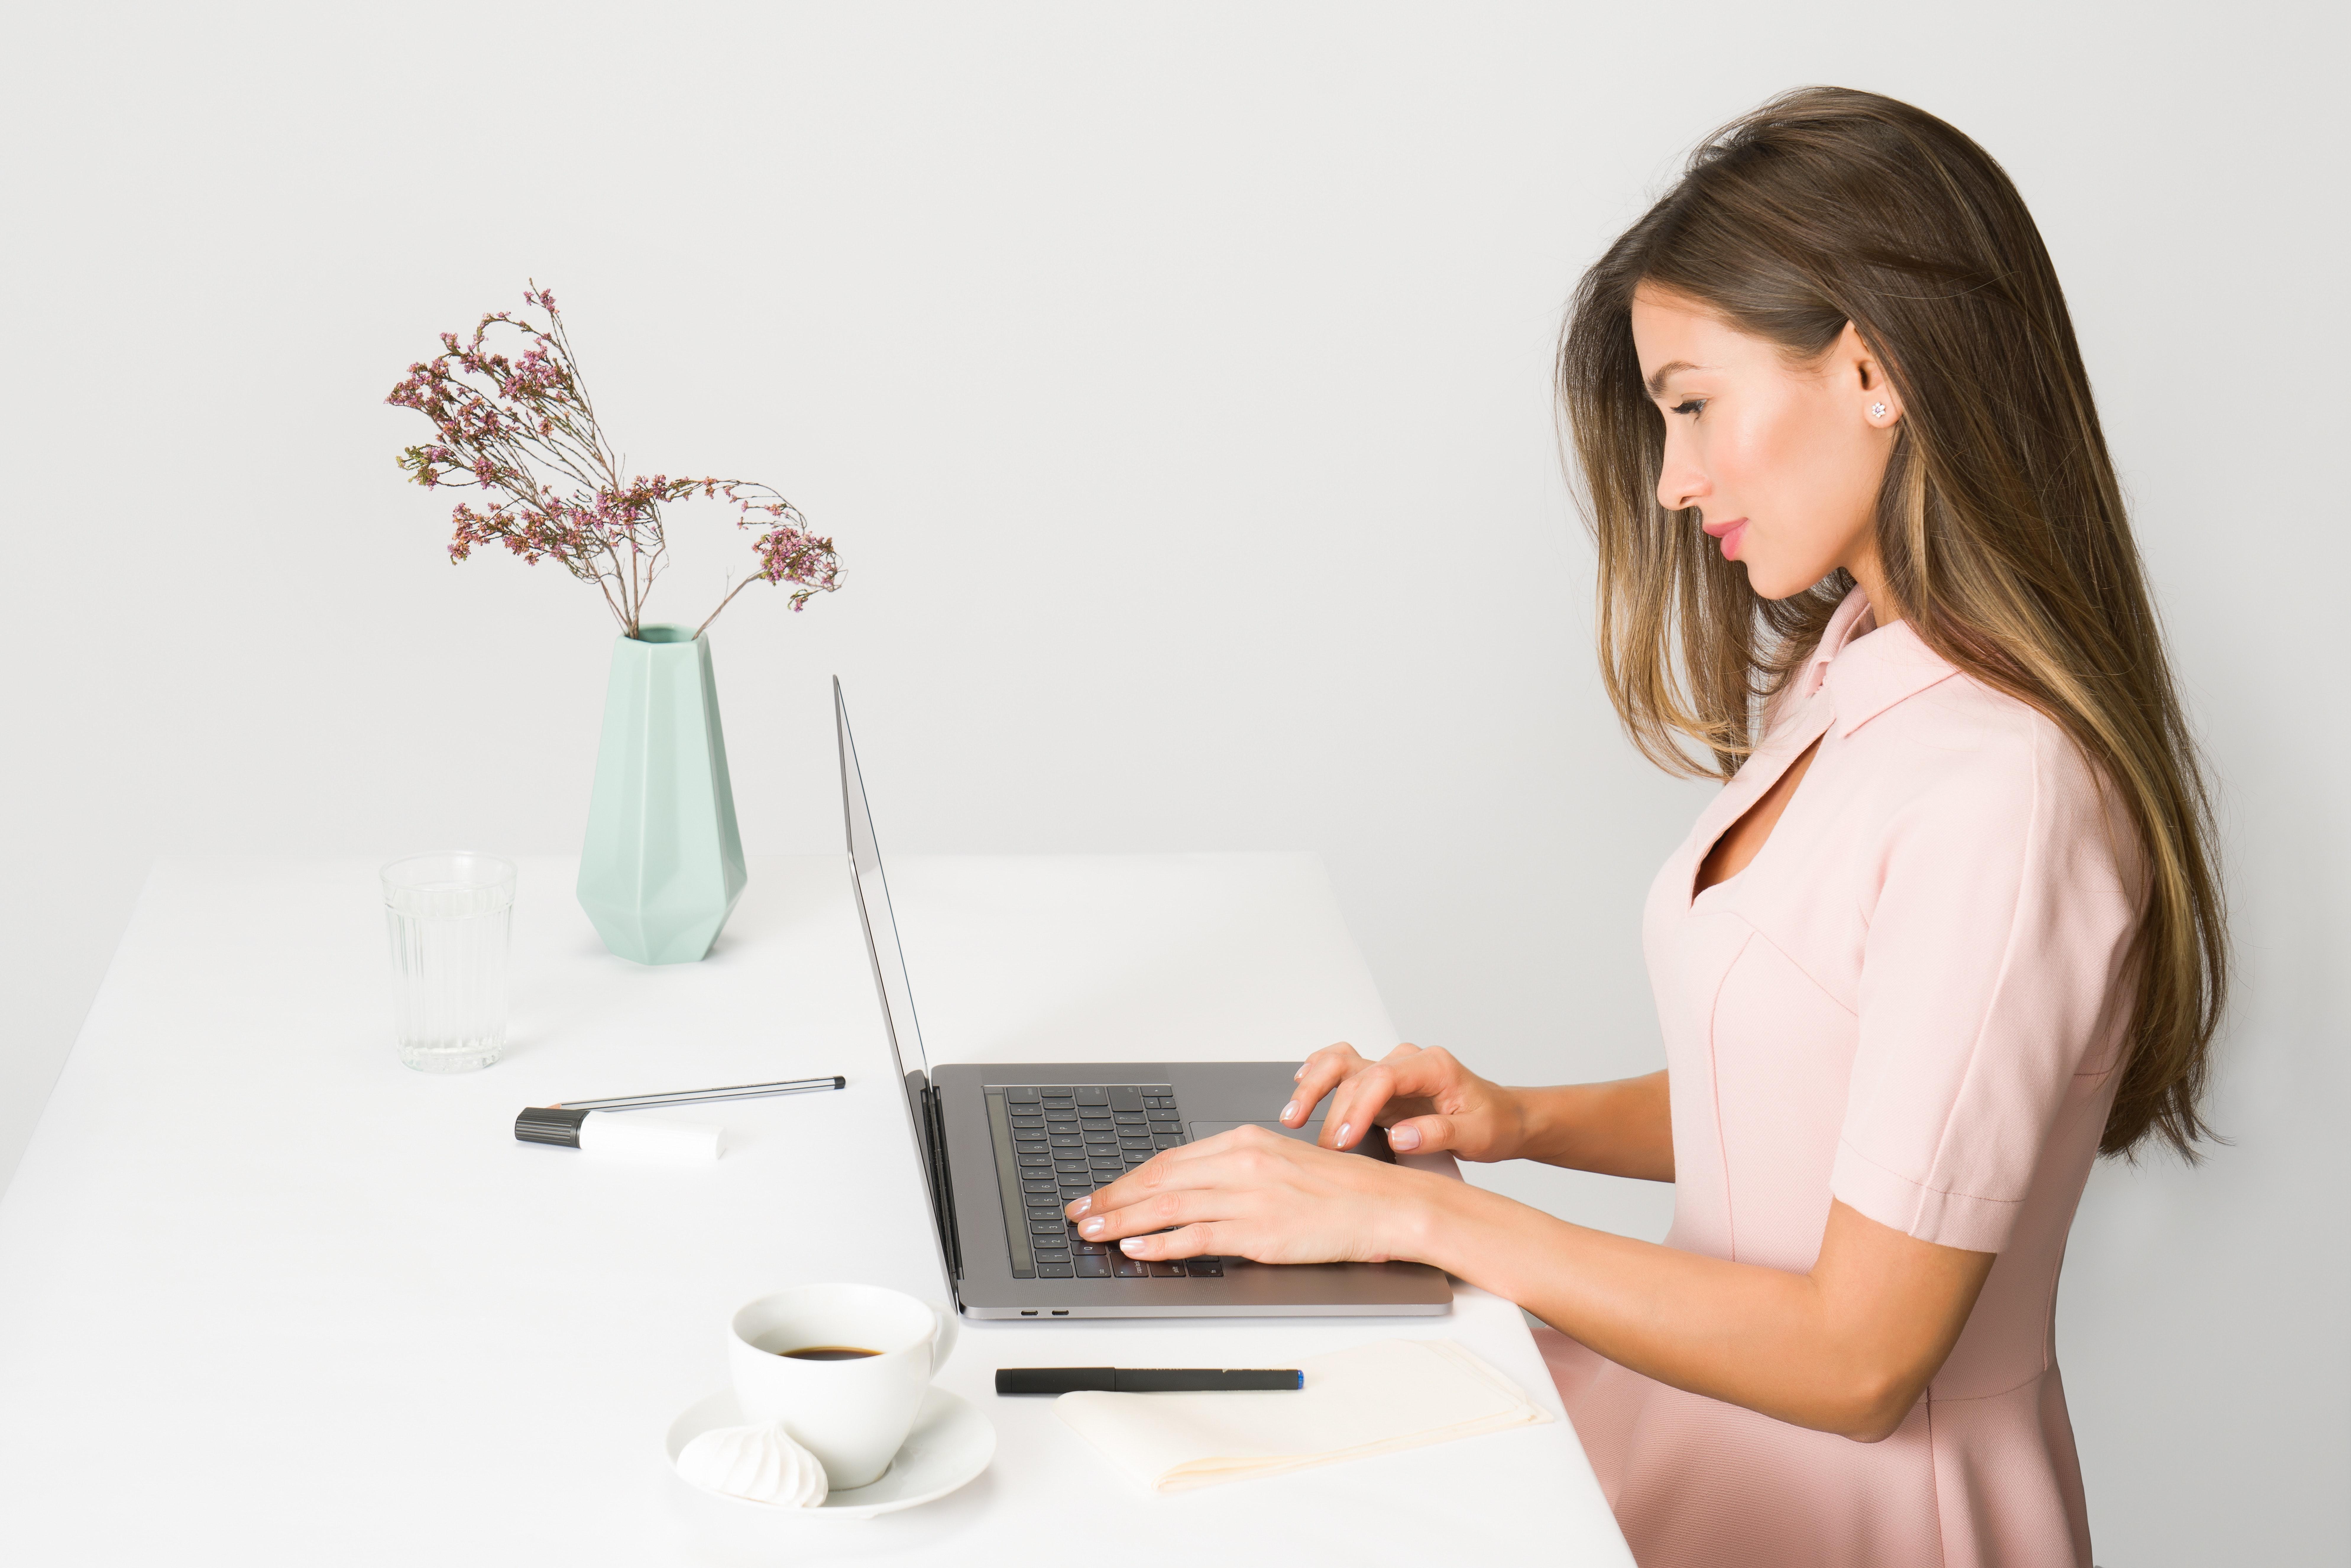 Bladeren dating websites